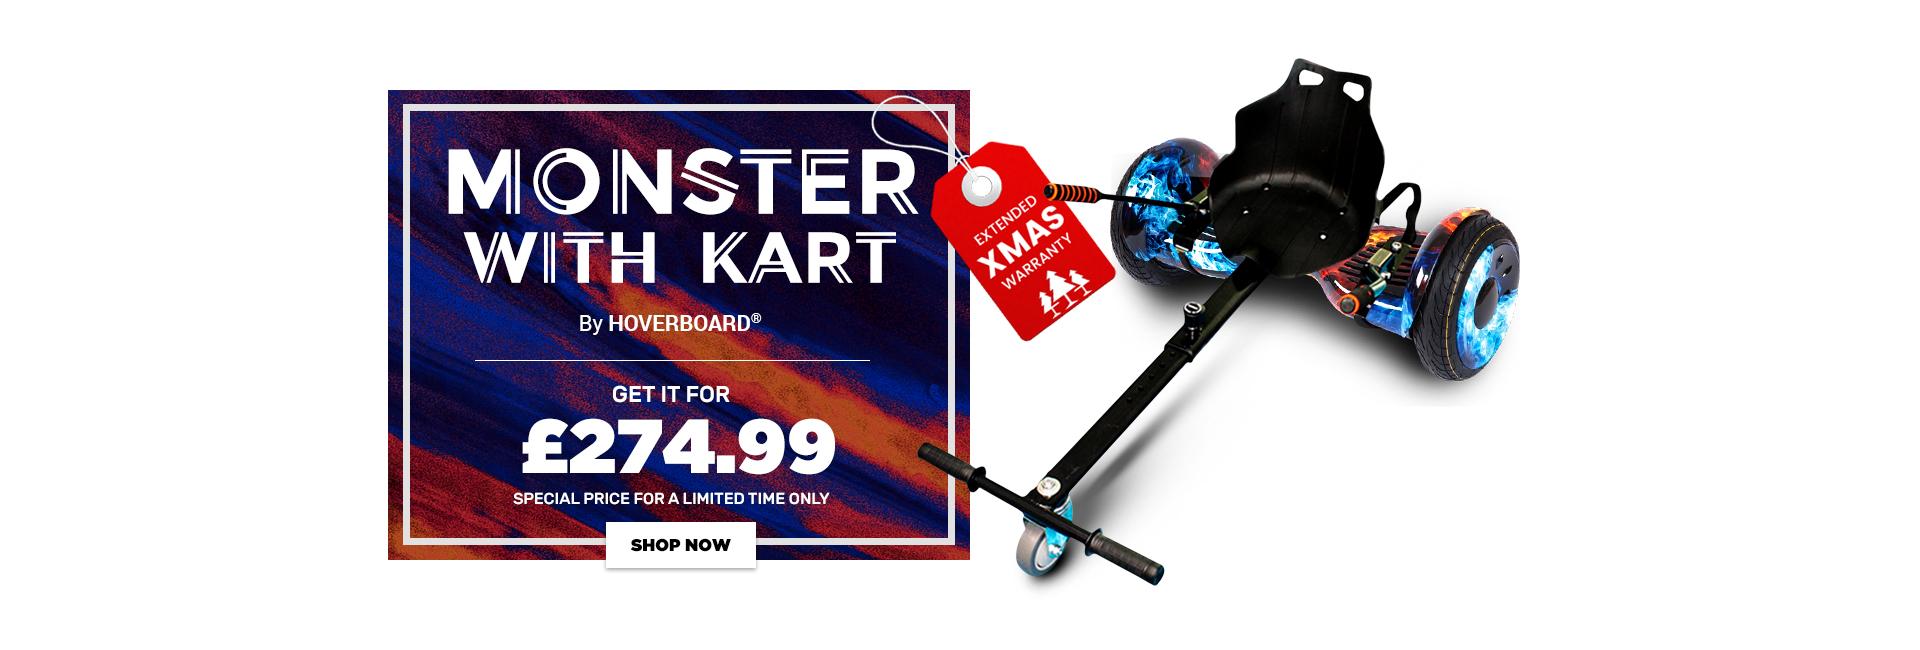 monster-hoverboard-gokart